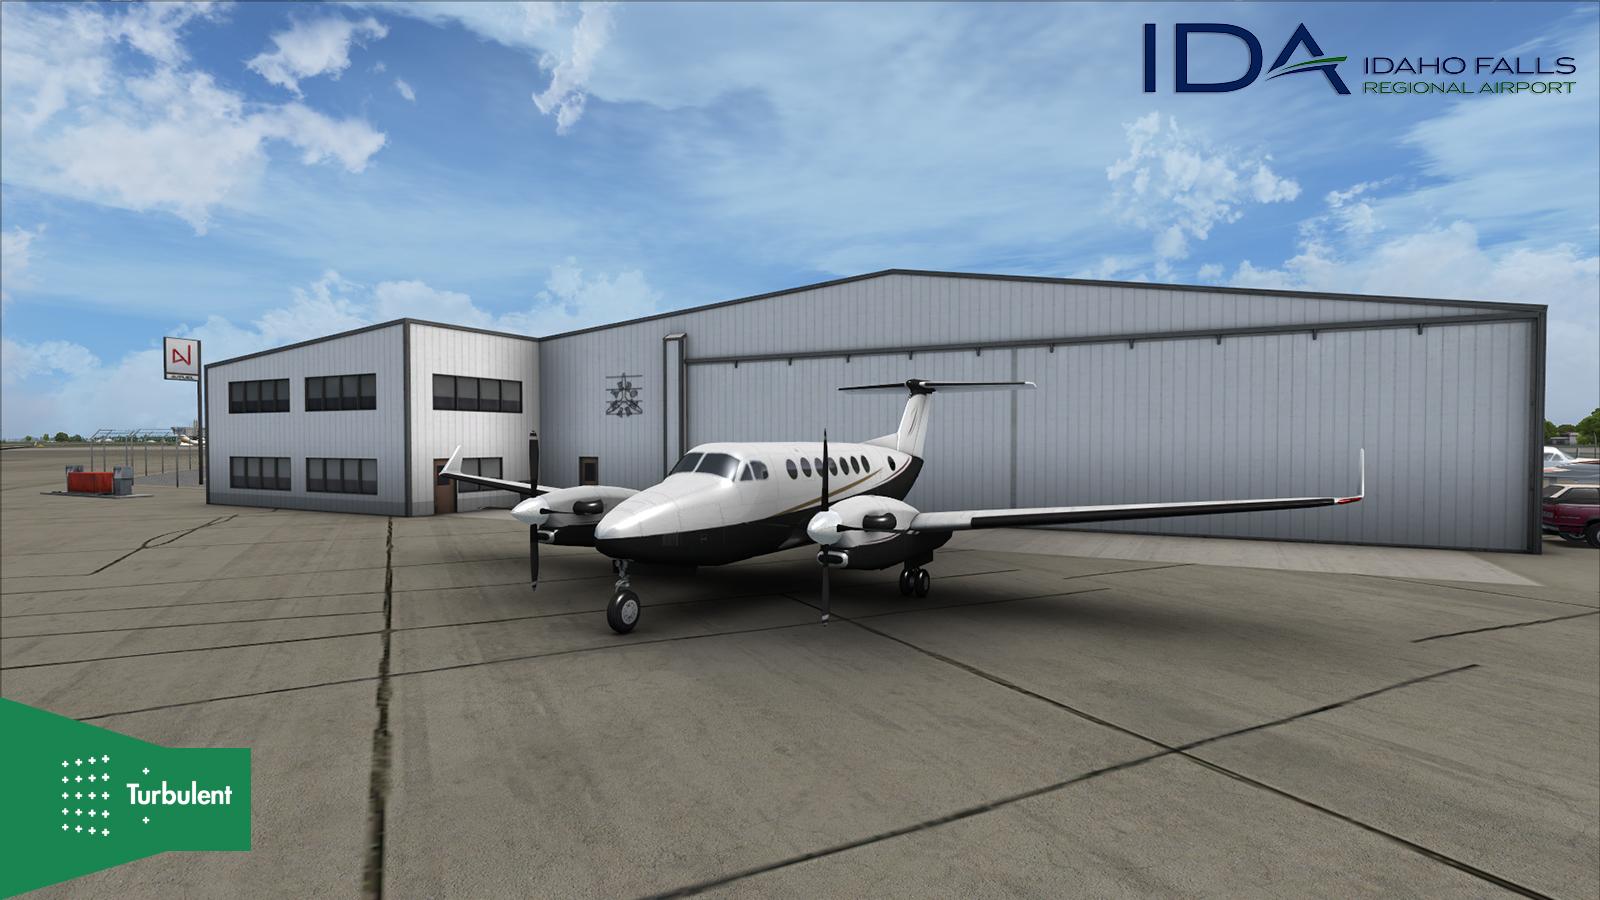 Idaho Backcountry Airports 3u2 Scenery For Fsx